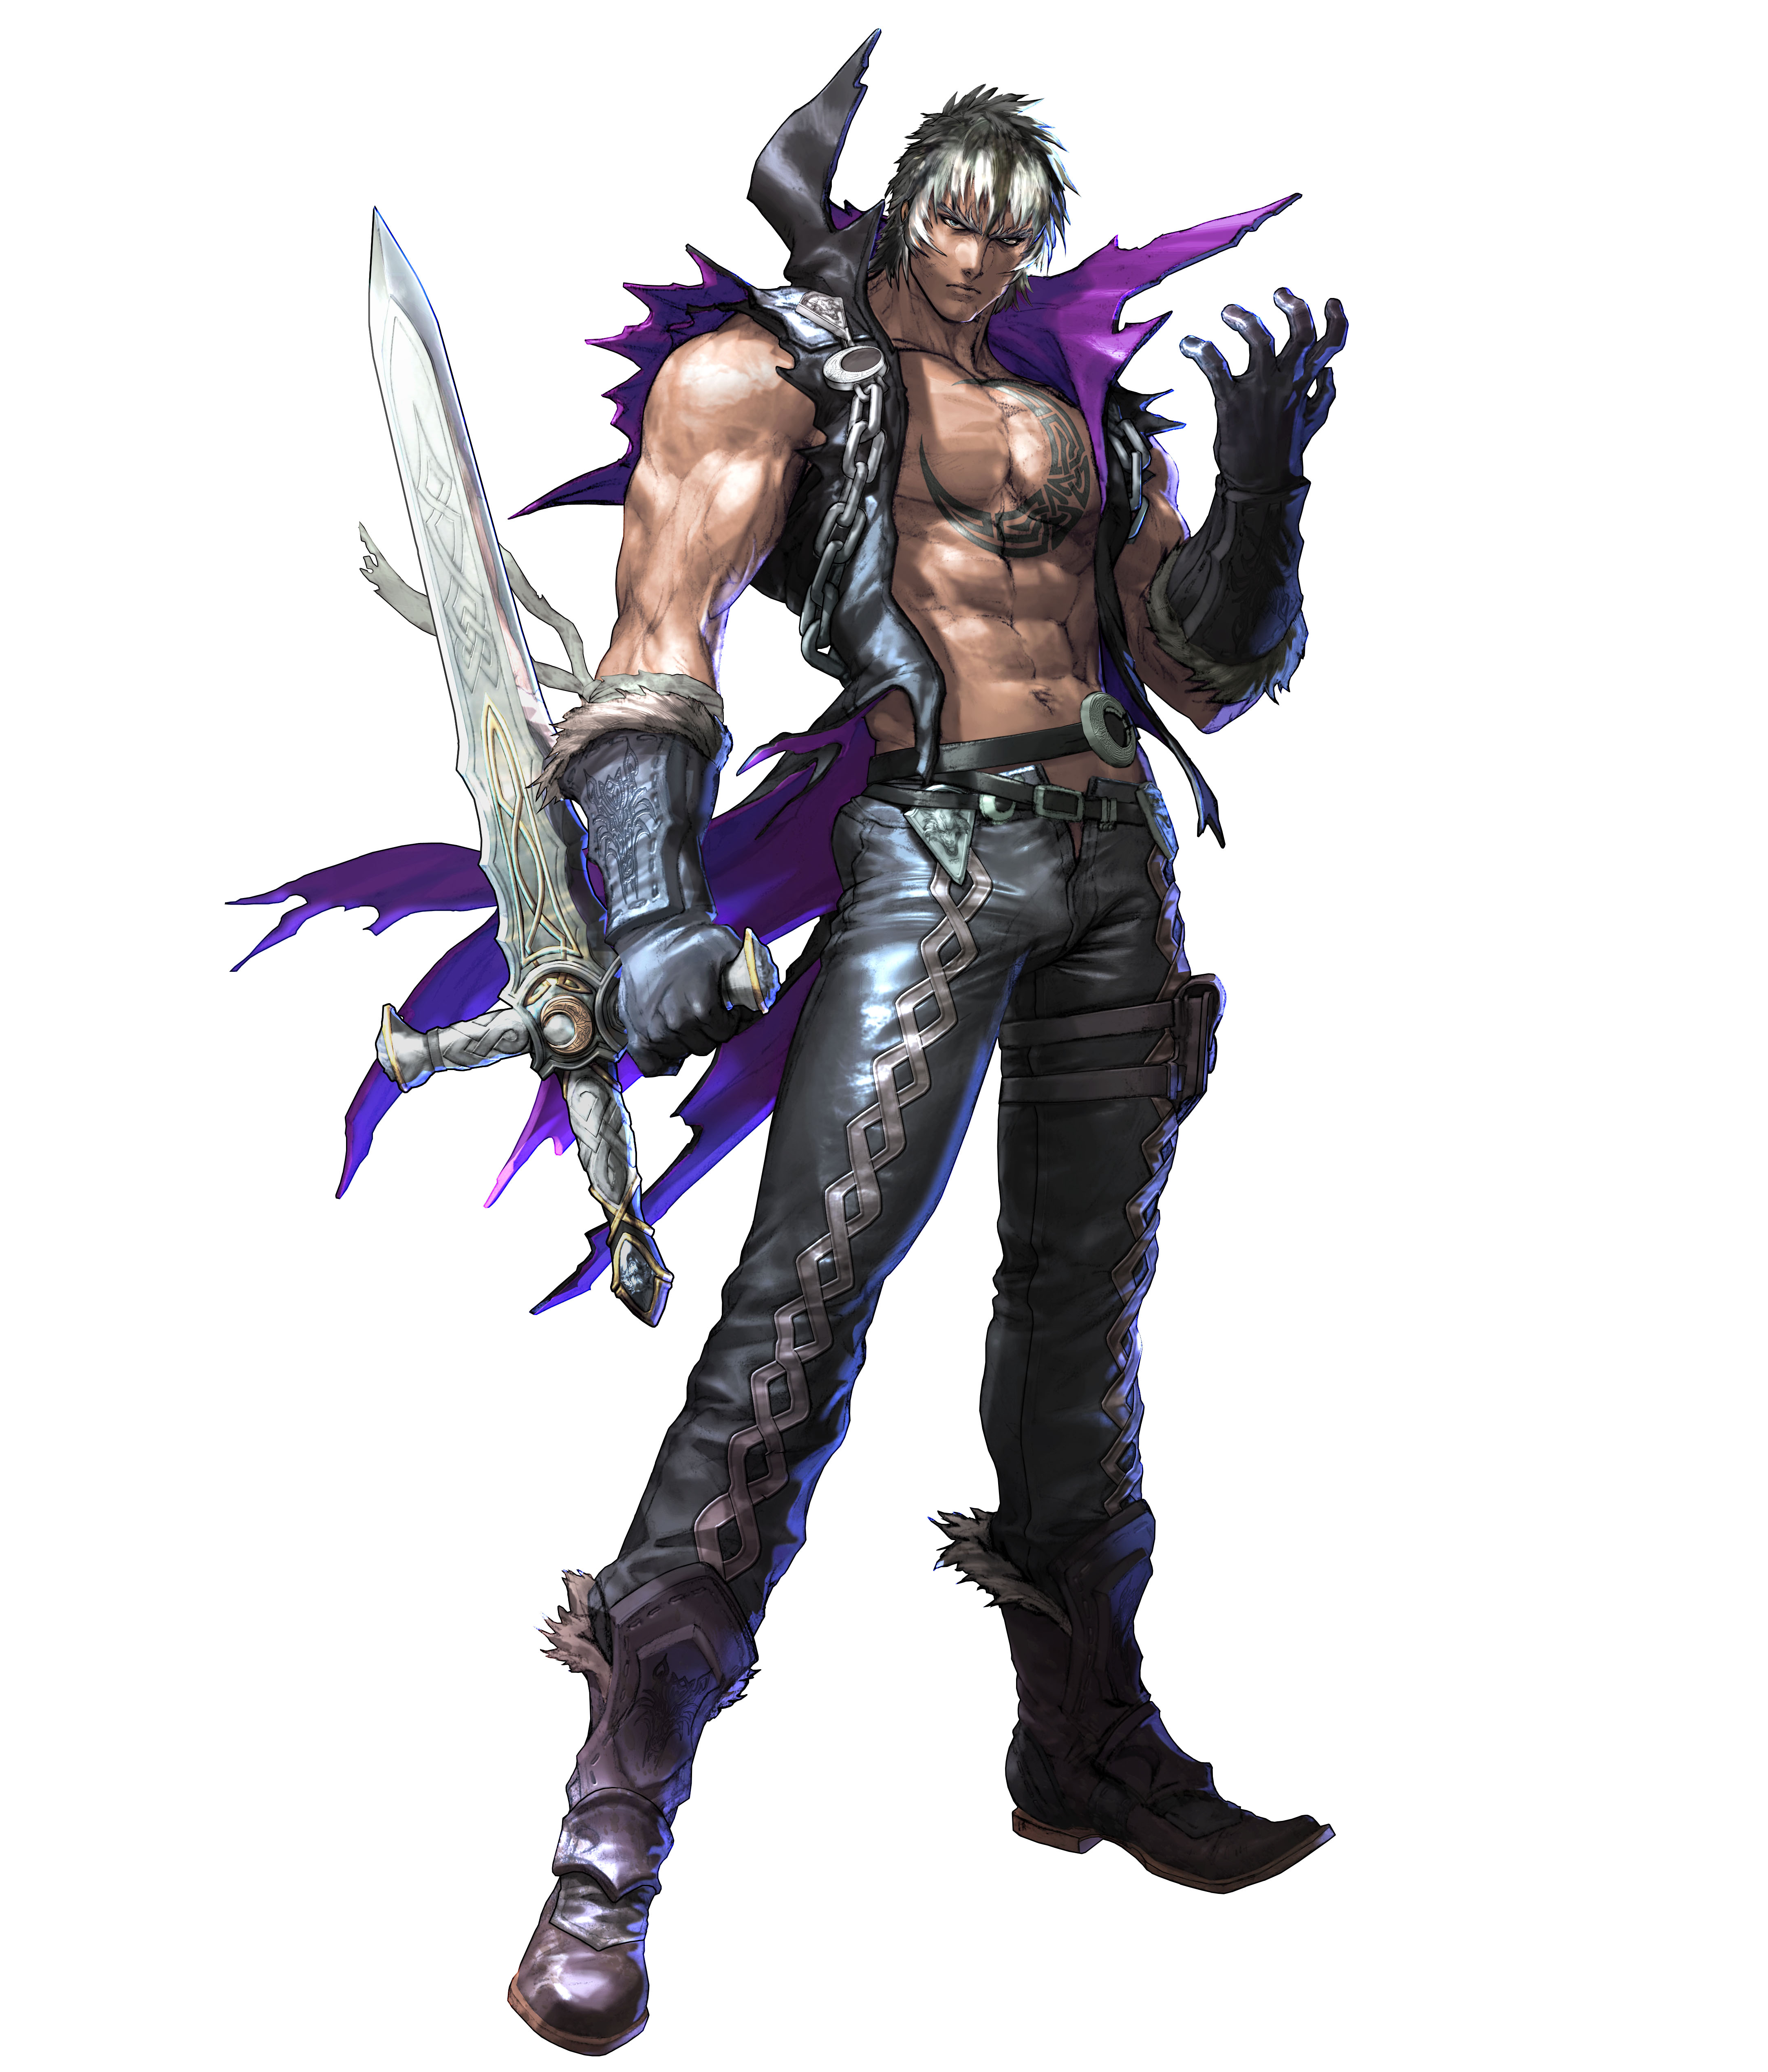 Nightmare (Soul Calibur) - Zerochan Anime Image Board